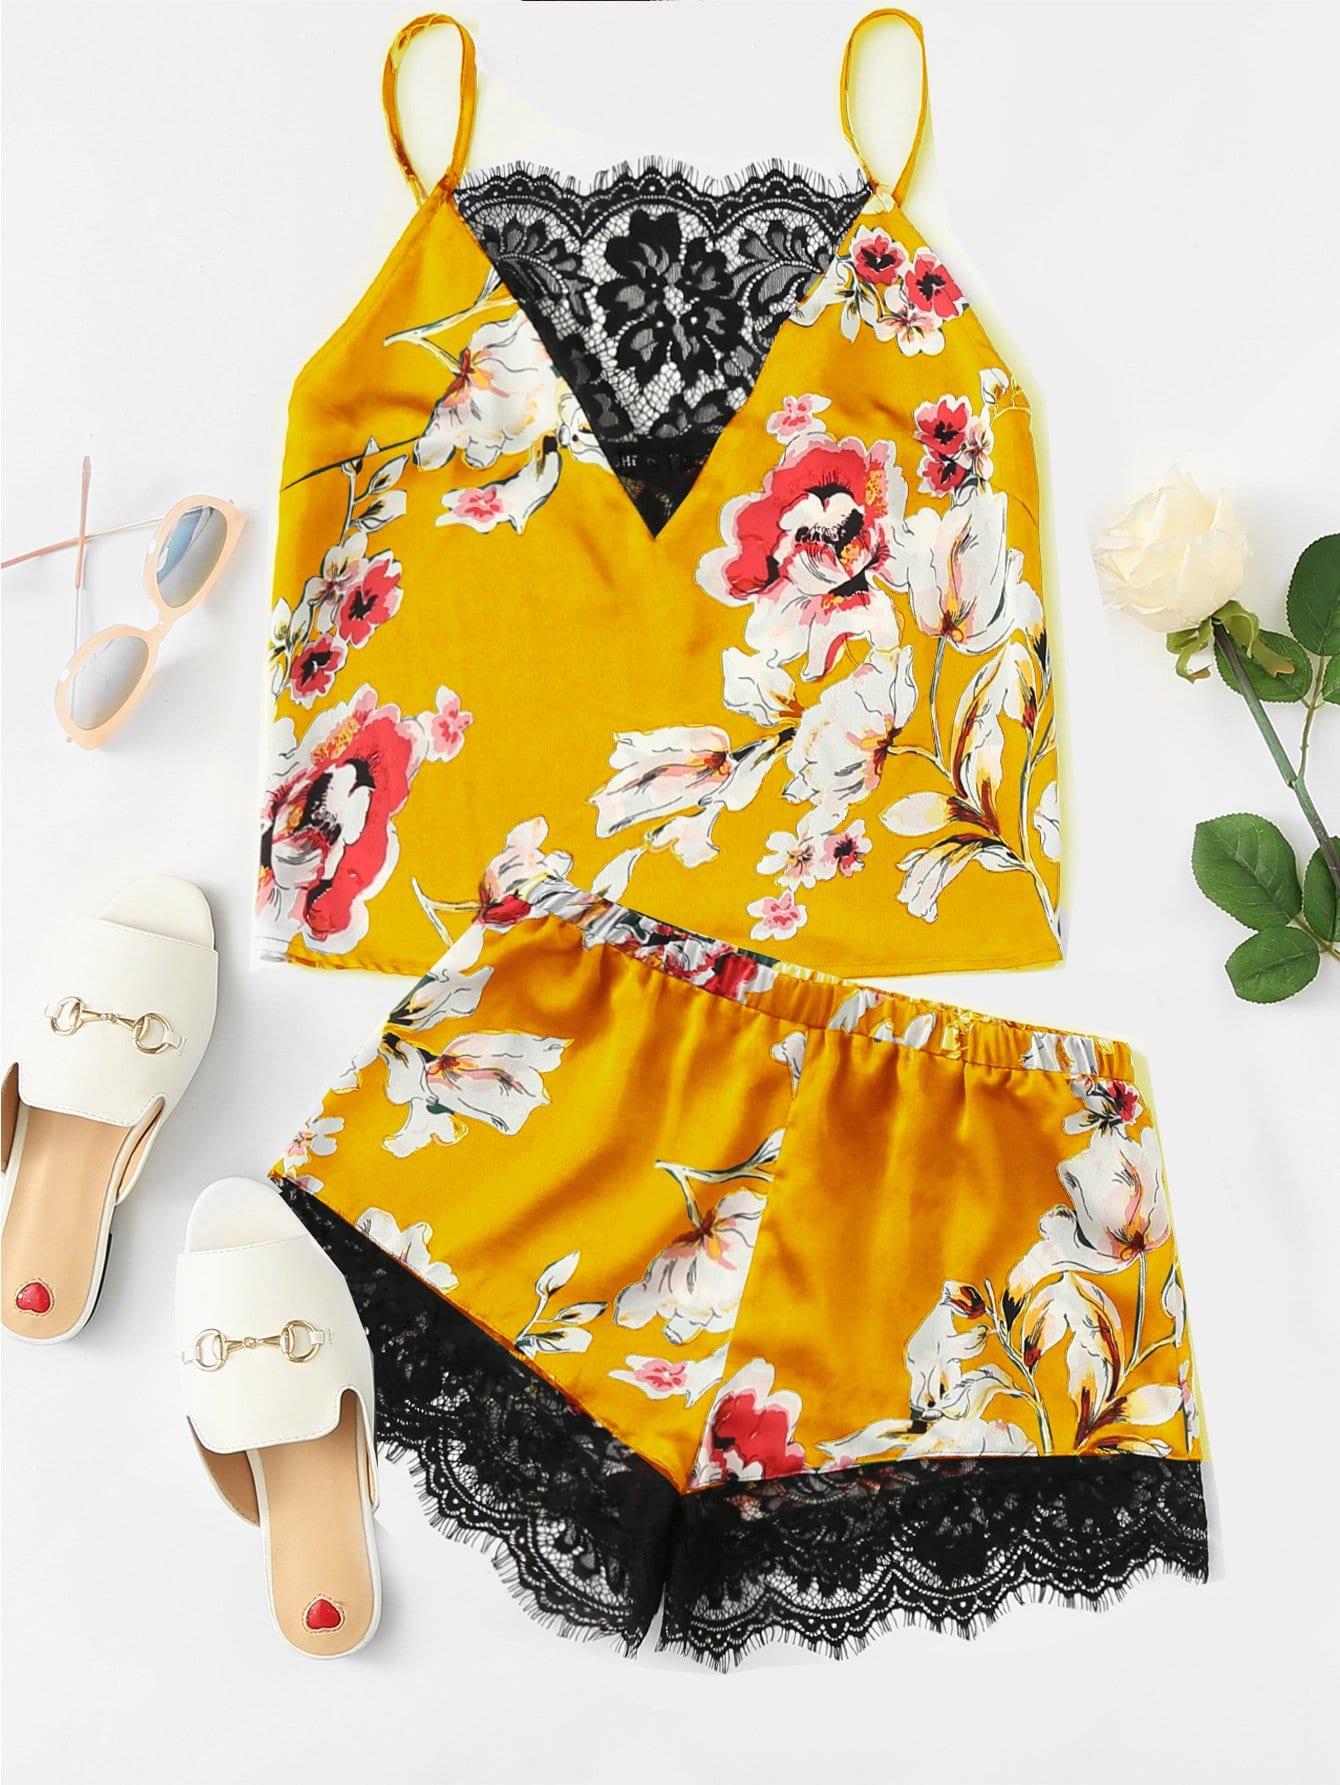 Floral Print Lace Insert Cami Top & Shorts PJ Set hanky hem floral print cami tank top